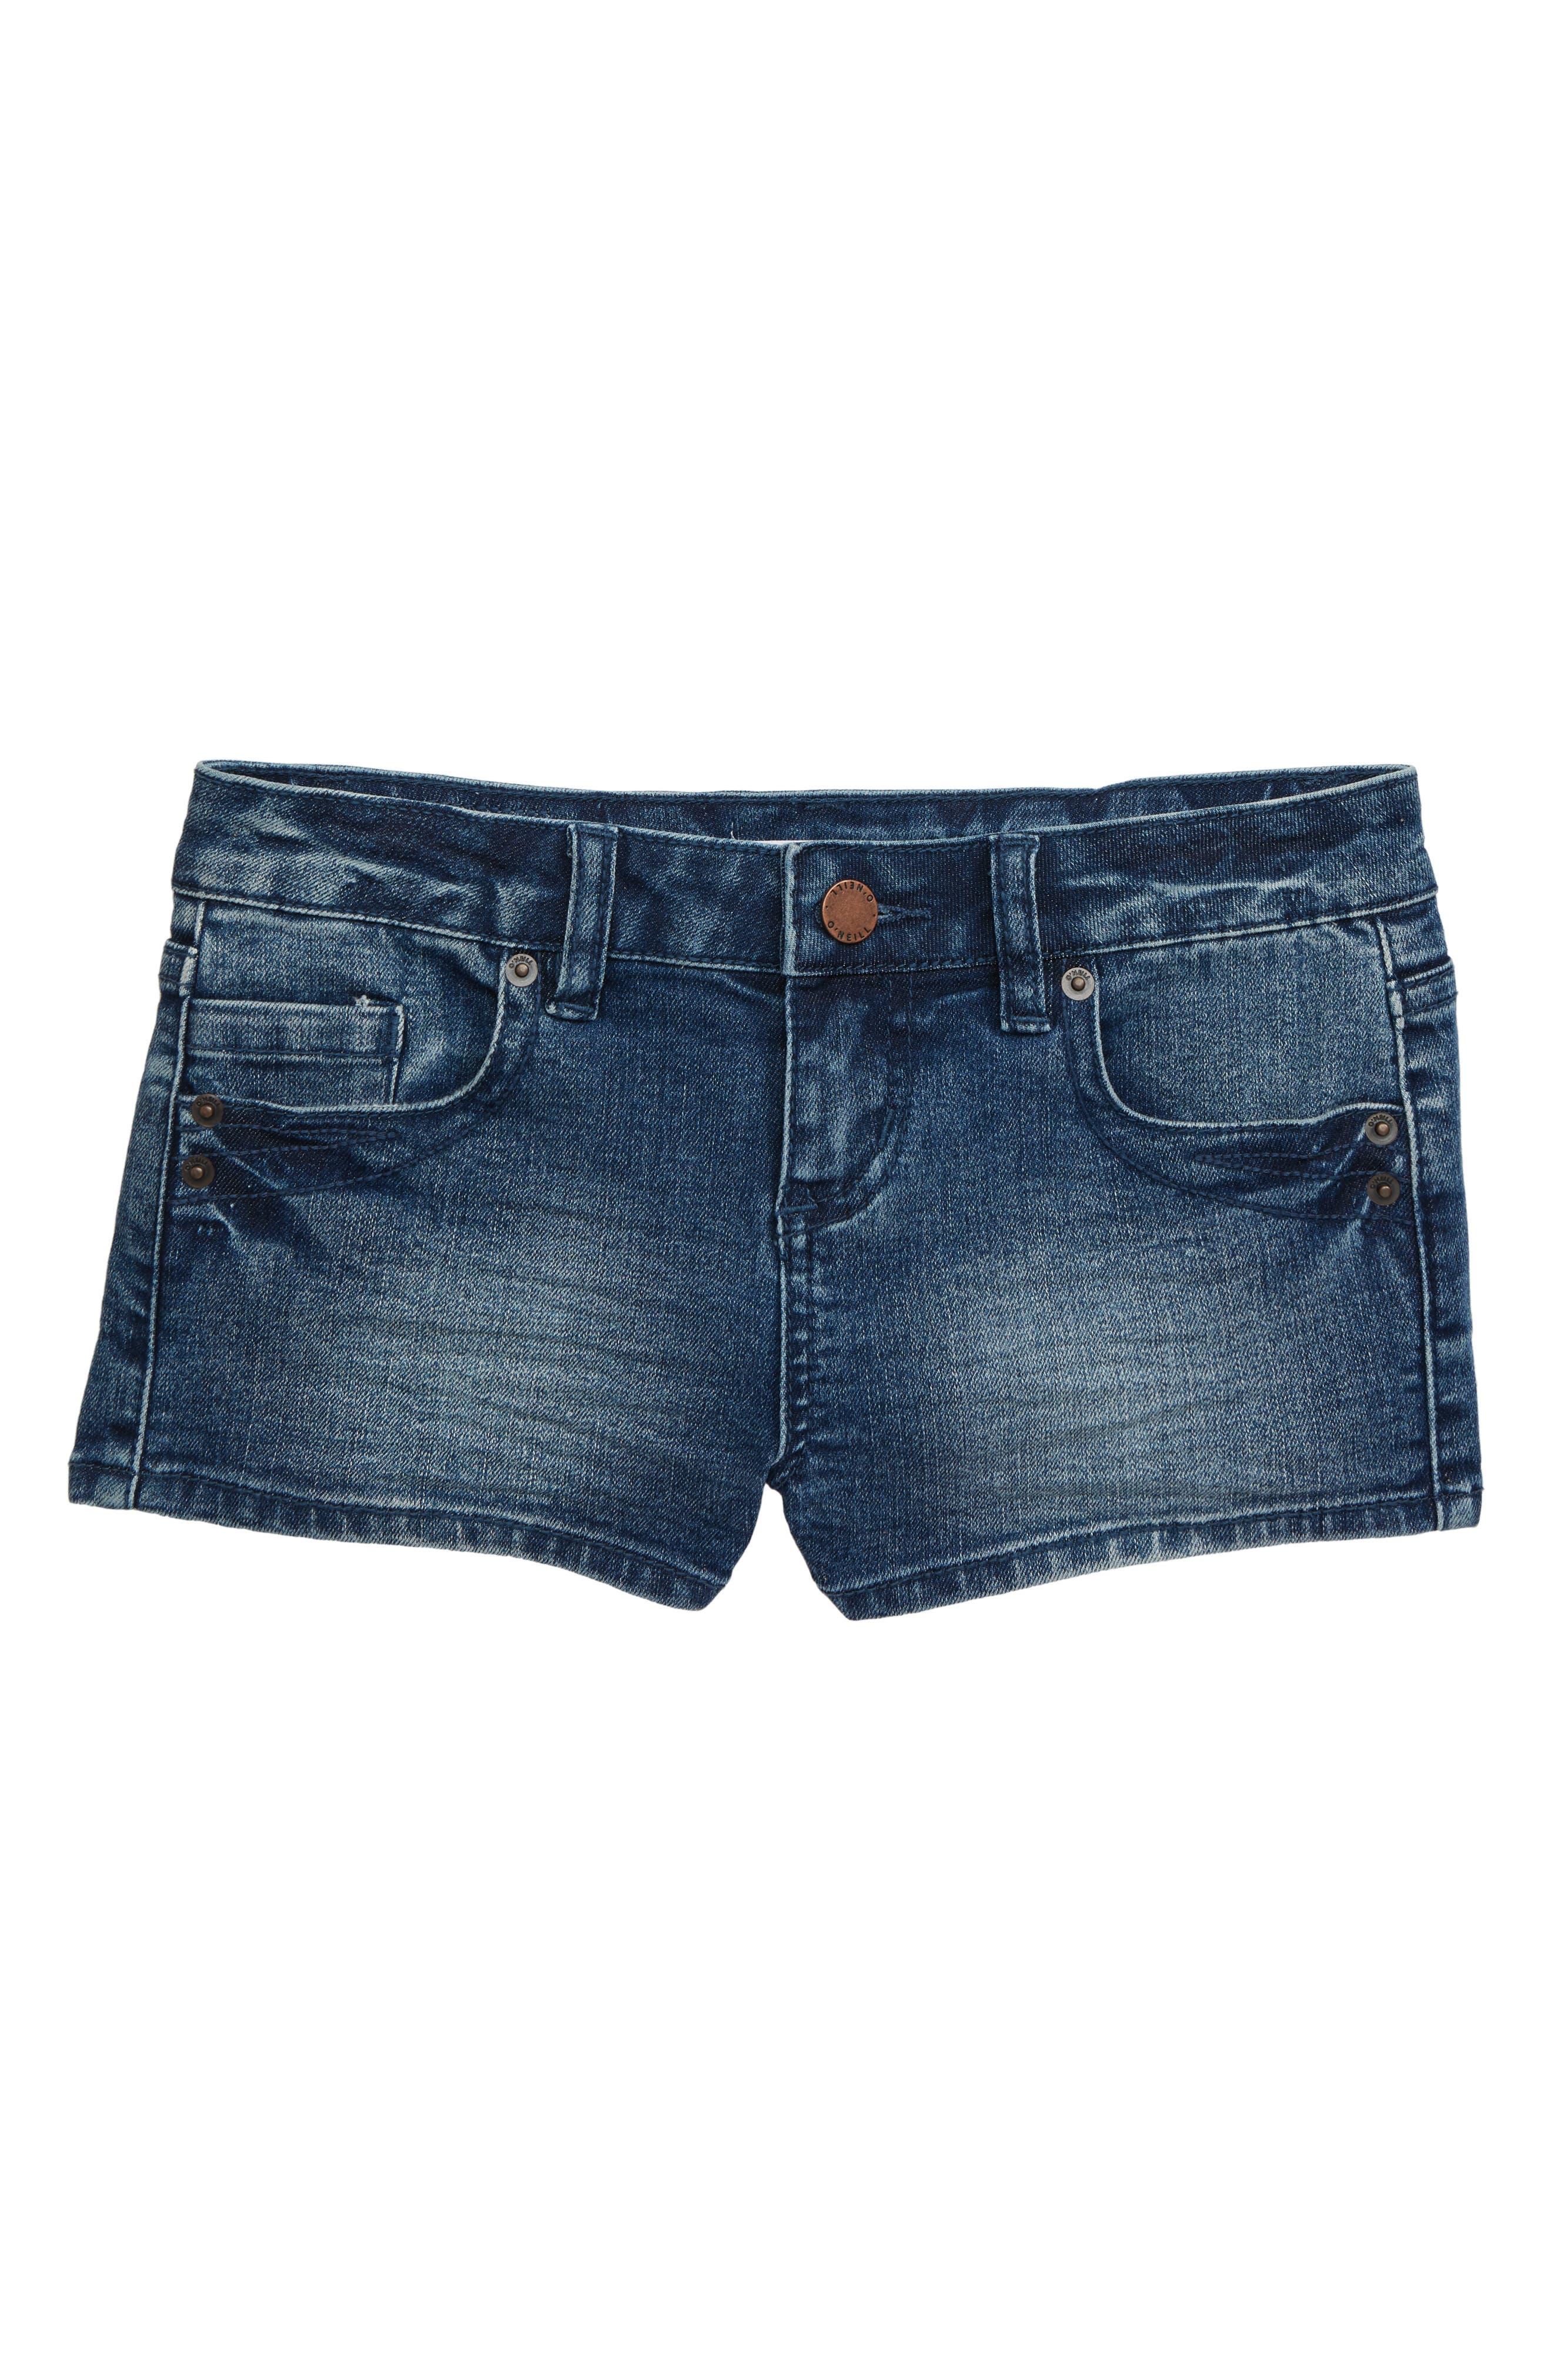 Girls ONeill Waidley 2 Denim Shorts Size 14  Blue